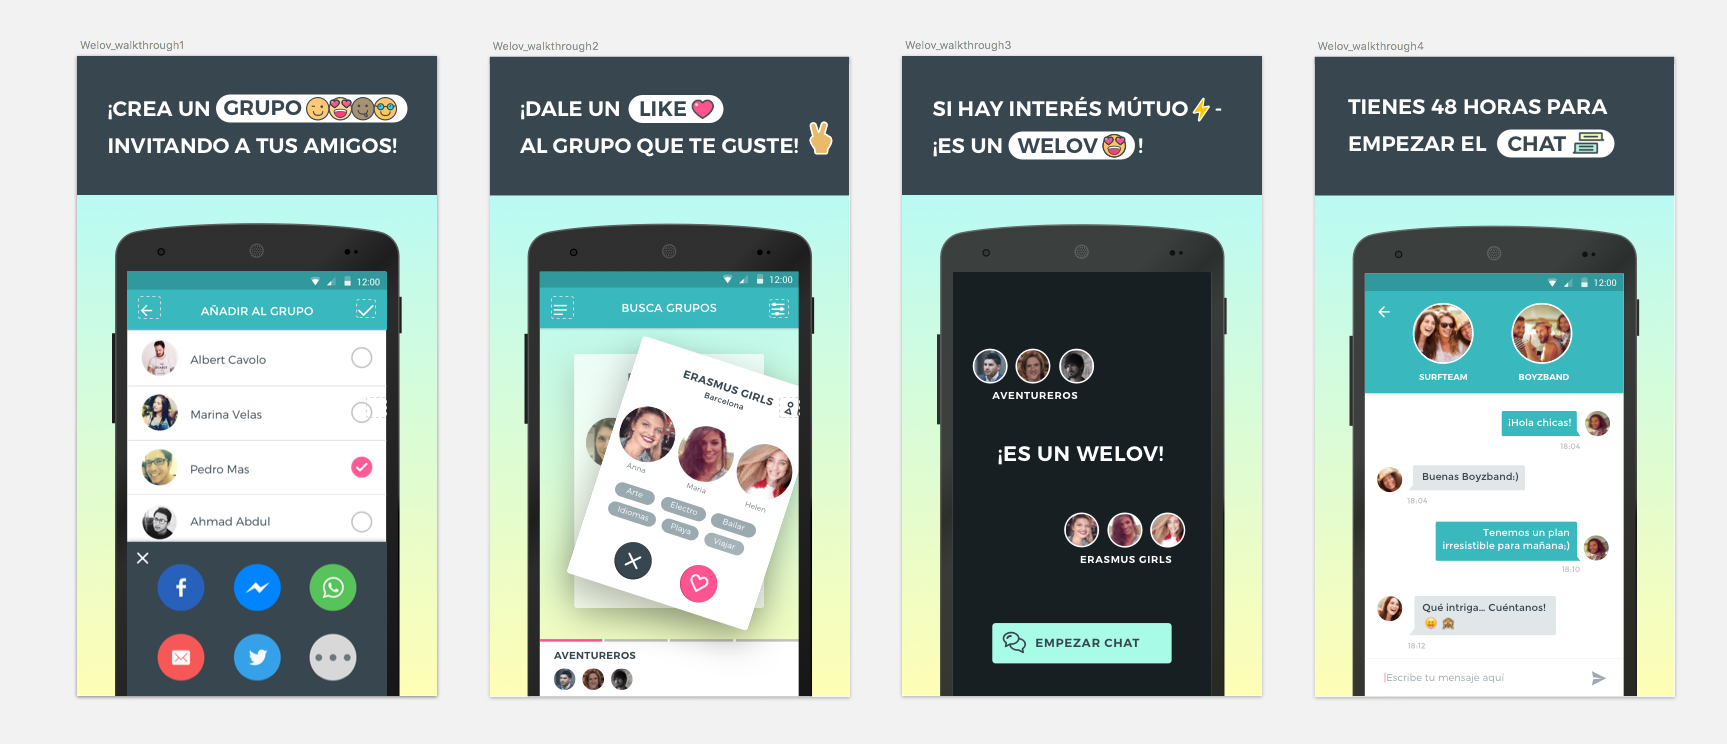 Madrid Dating App Putas En Mallorca-89800